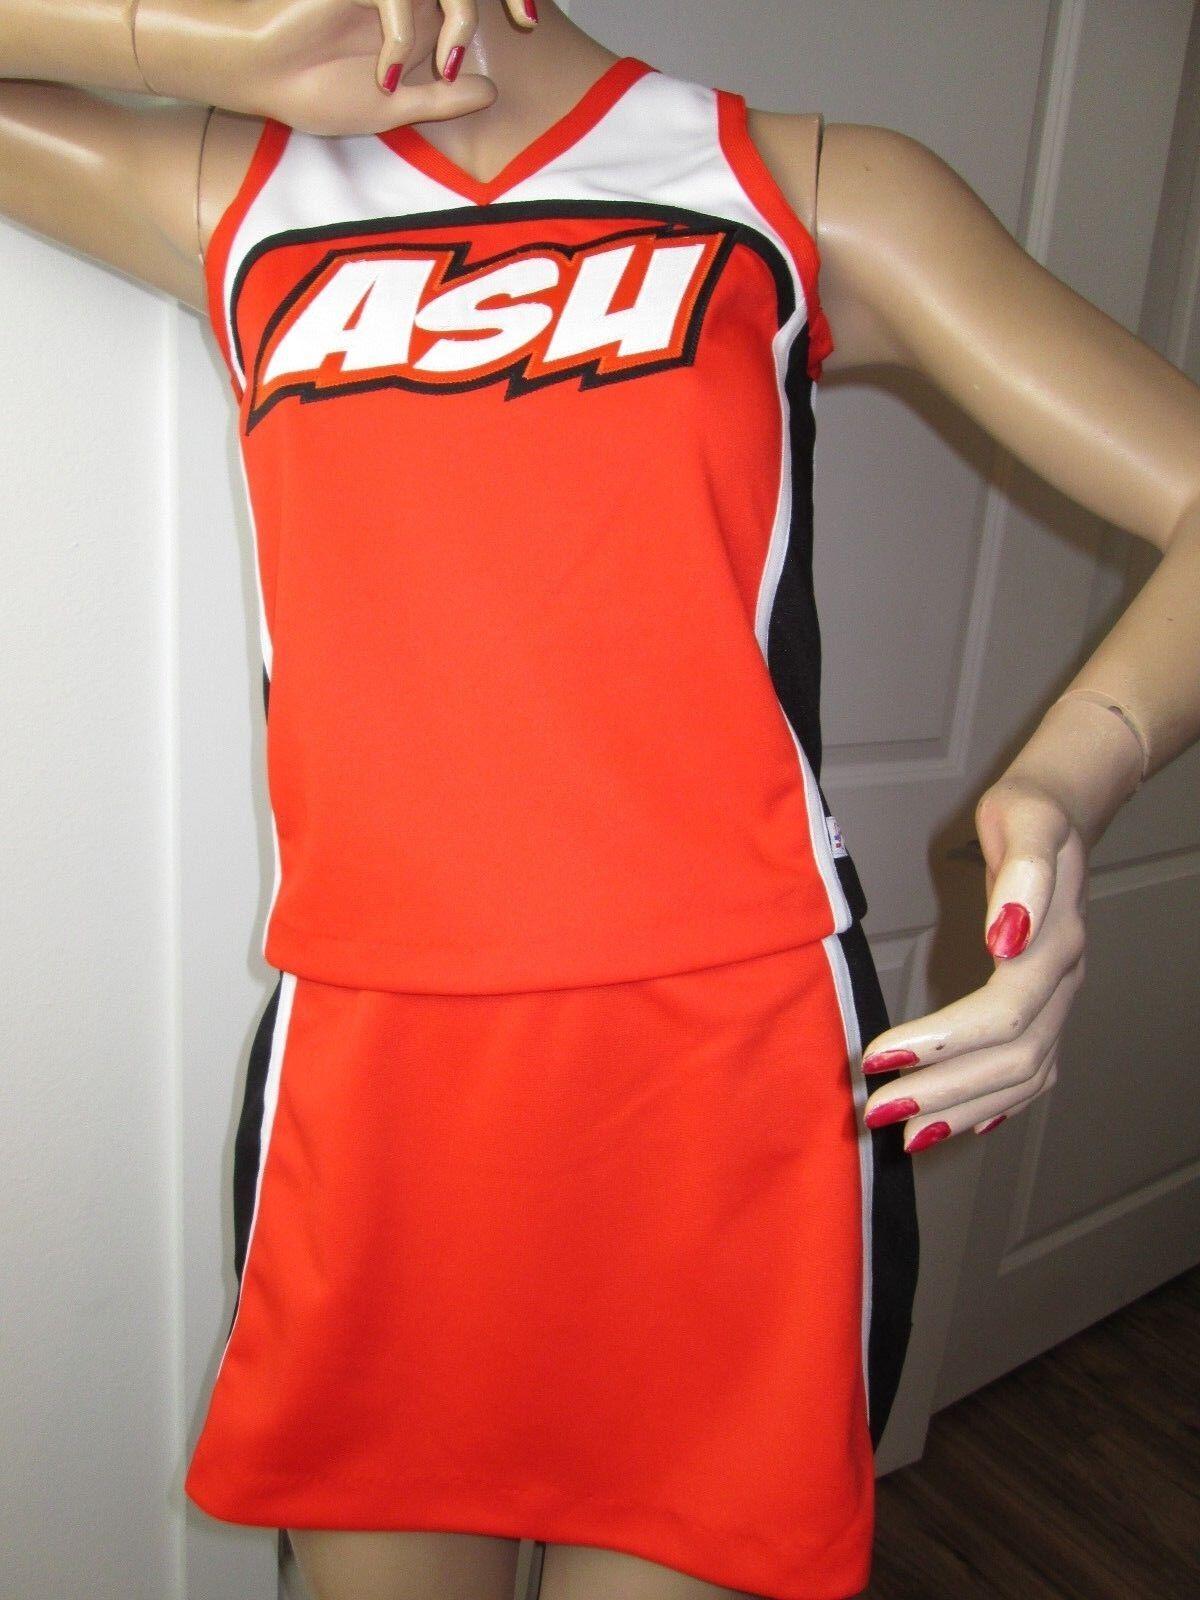 Cheerleader Uniform Outfit Costume Adult Medium Size 36  Top Elastic Waist Skirt